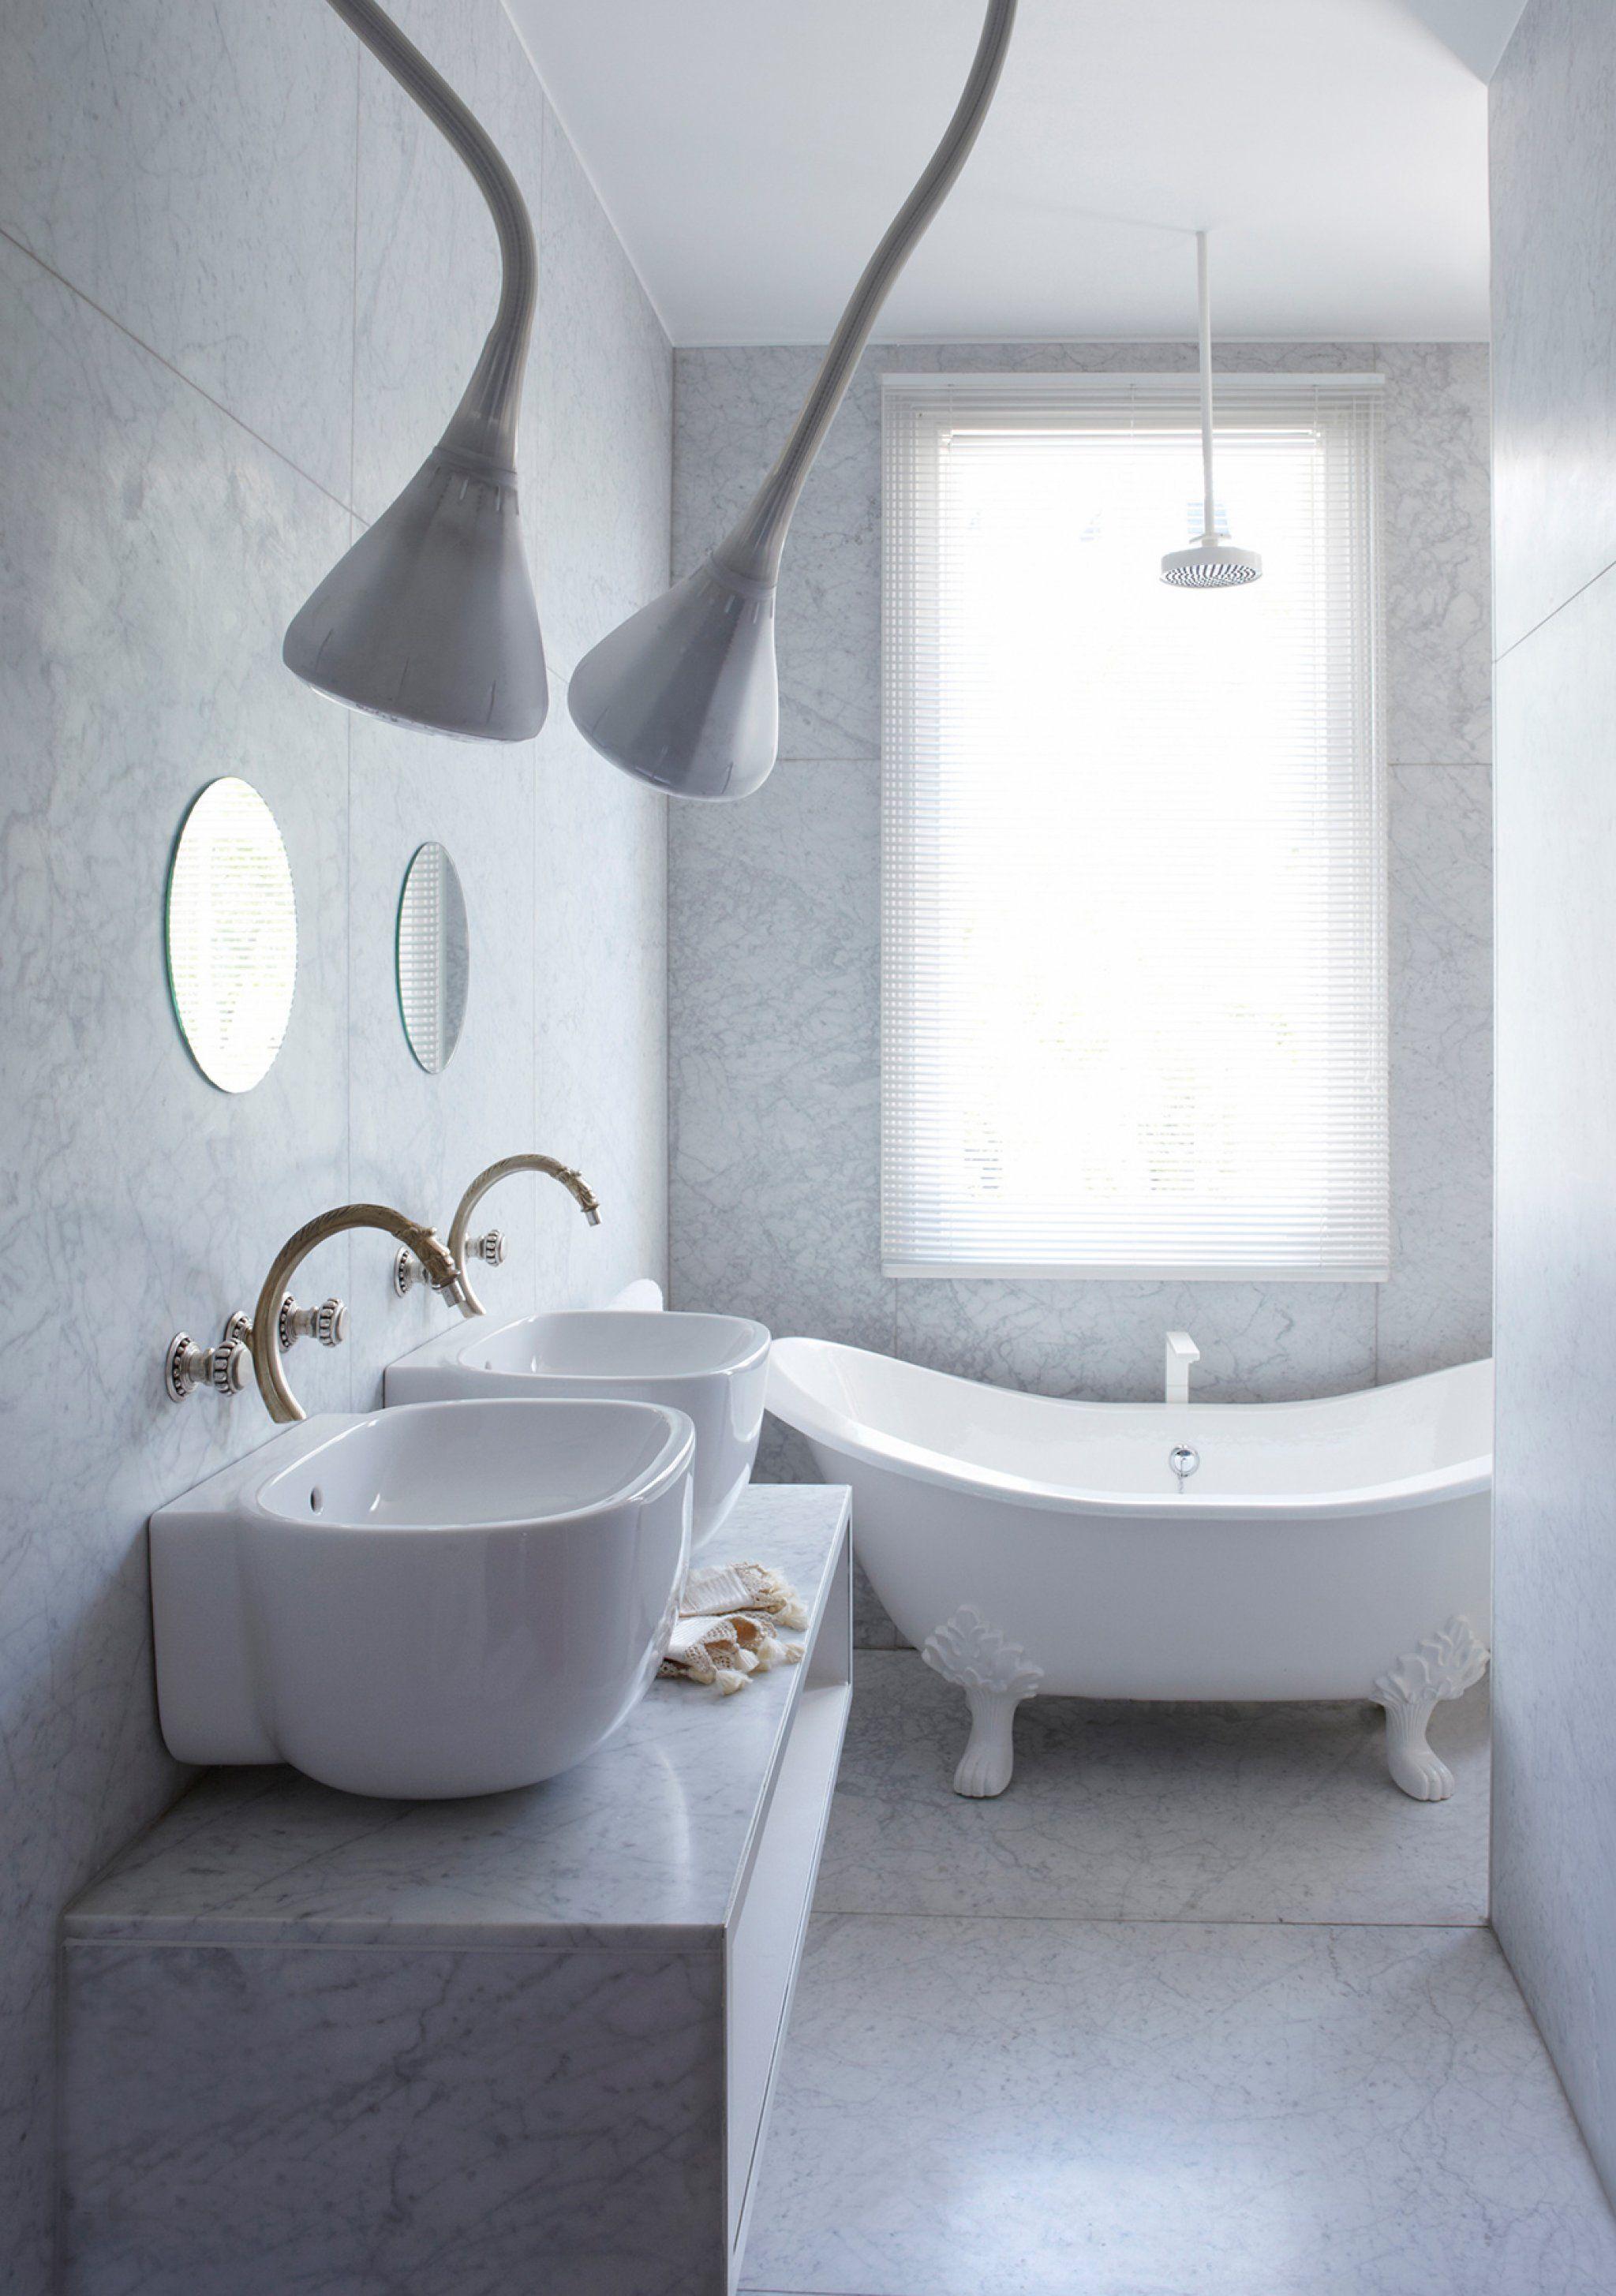 white bathroom design by annabel karim kassar from project notting hill house - Bathroom Designs Lebanon